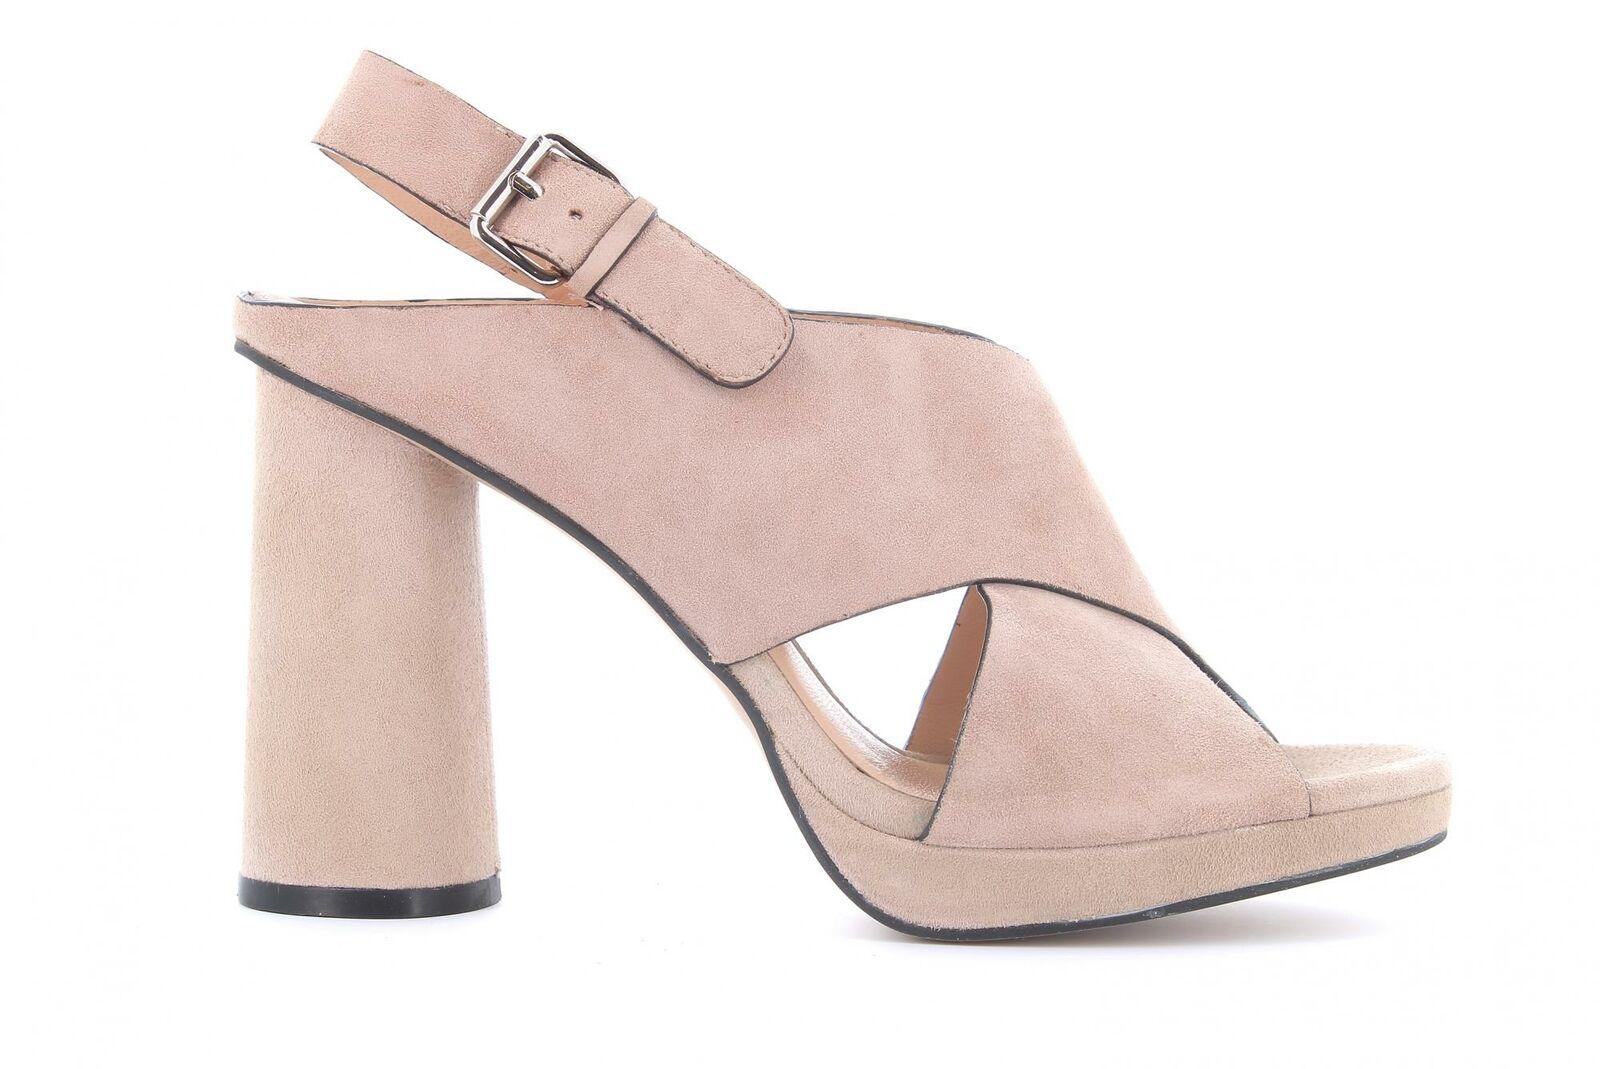 CRIS vergre & 039;P19g Womens shoes Heel Sandals EJ4408N Pink